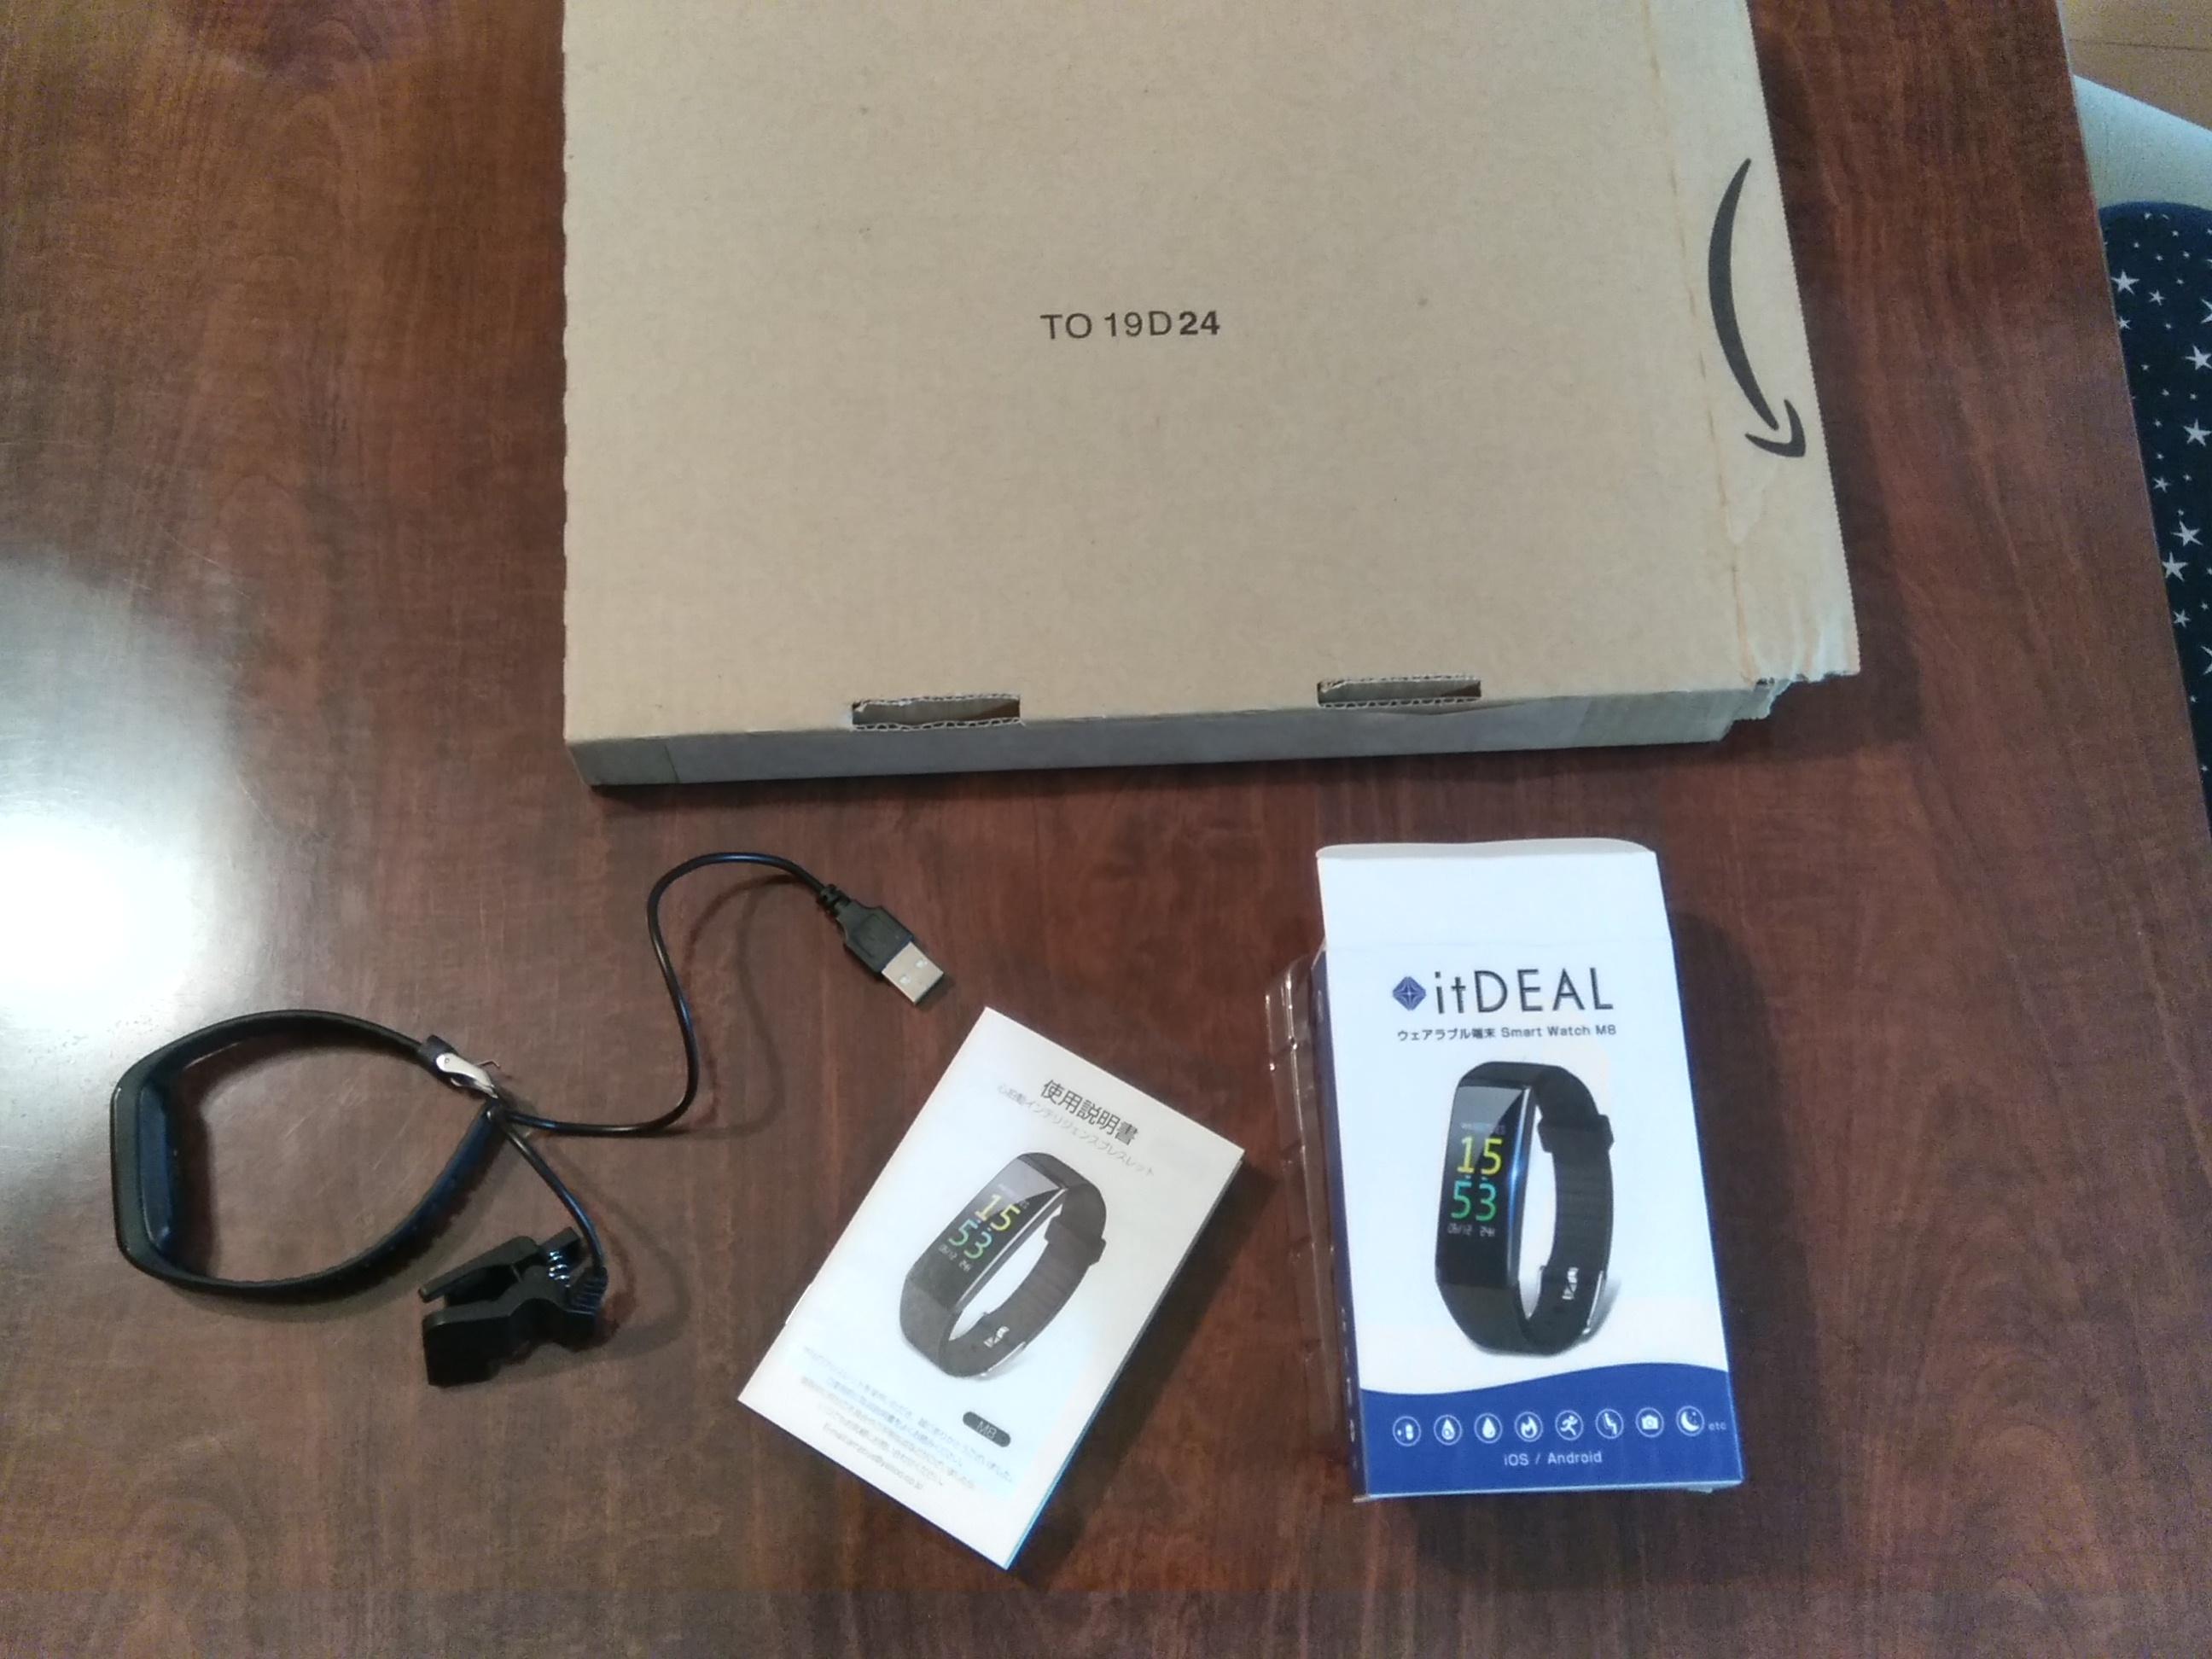 itDEAL M8 (スマートウォッチ)の購入・レビュー(評価